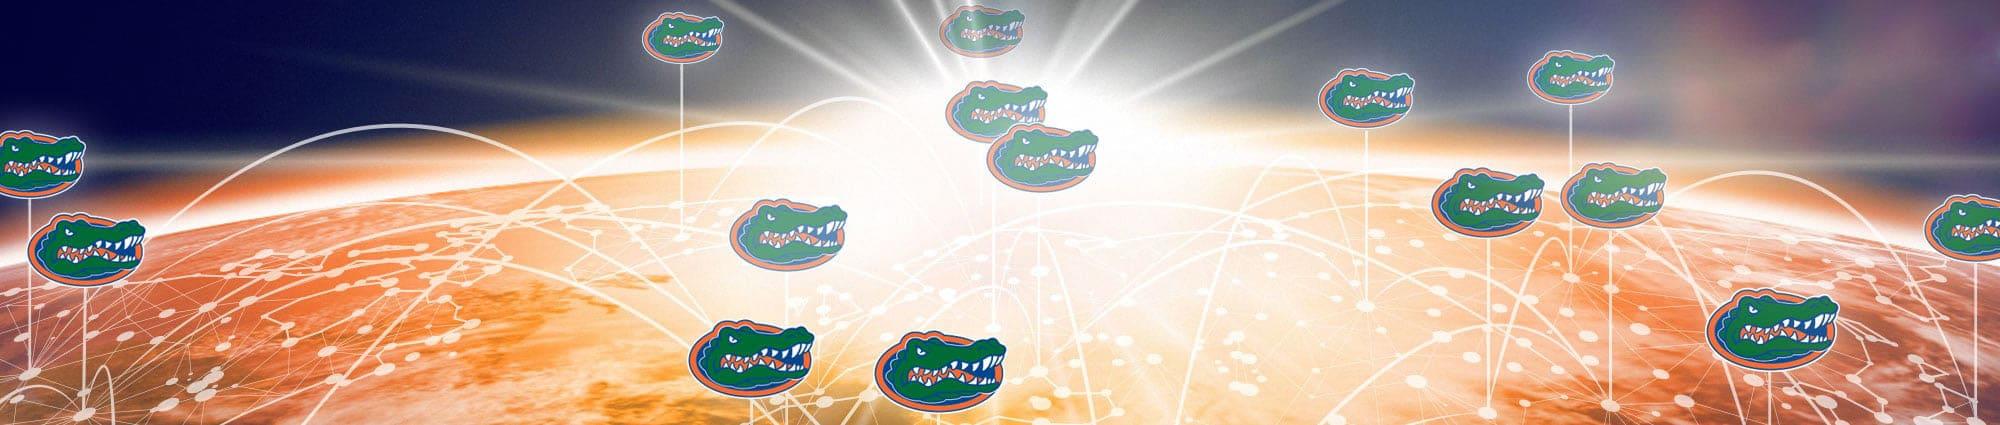 planet earth gator network alumni